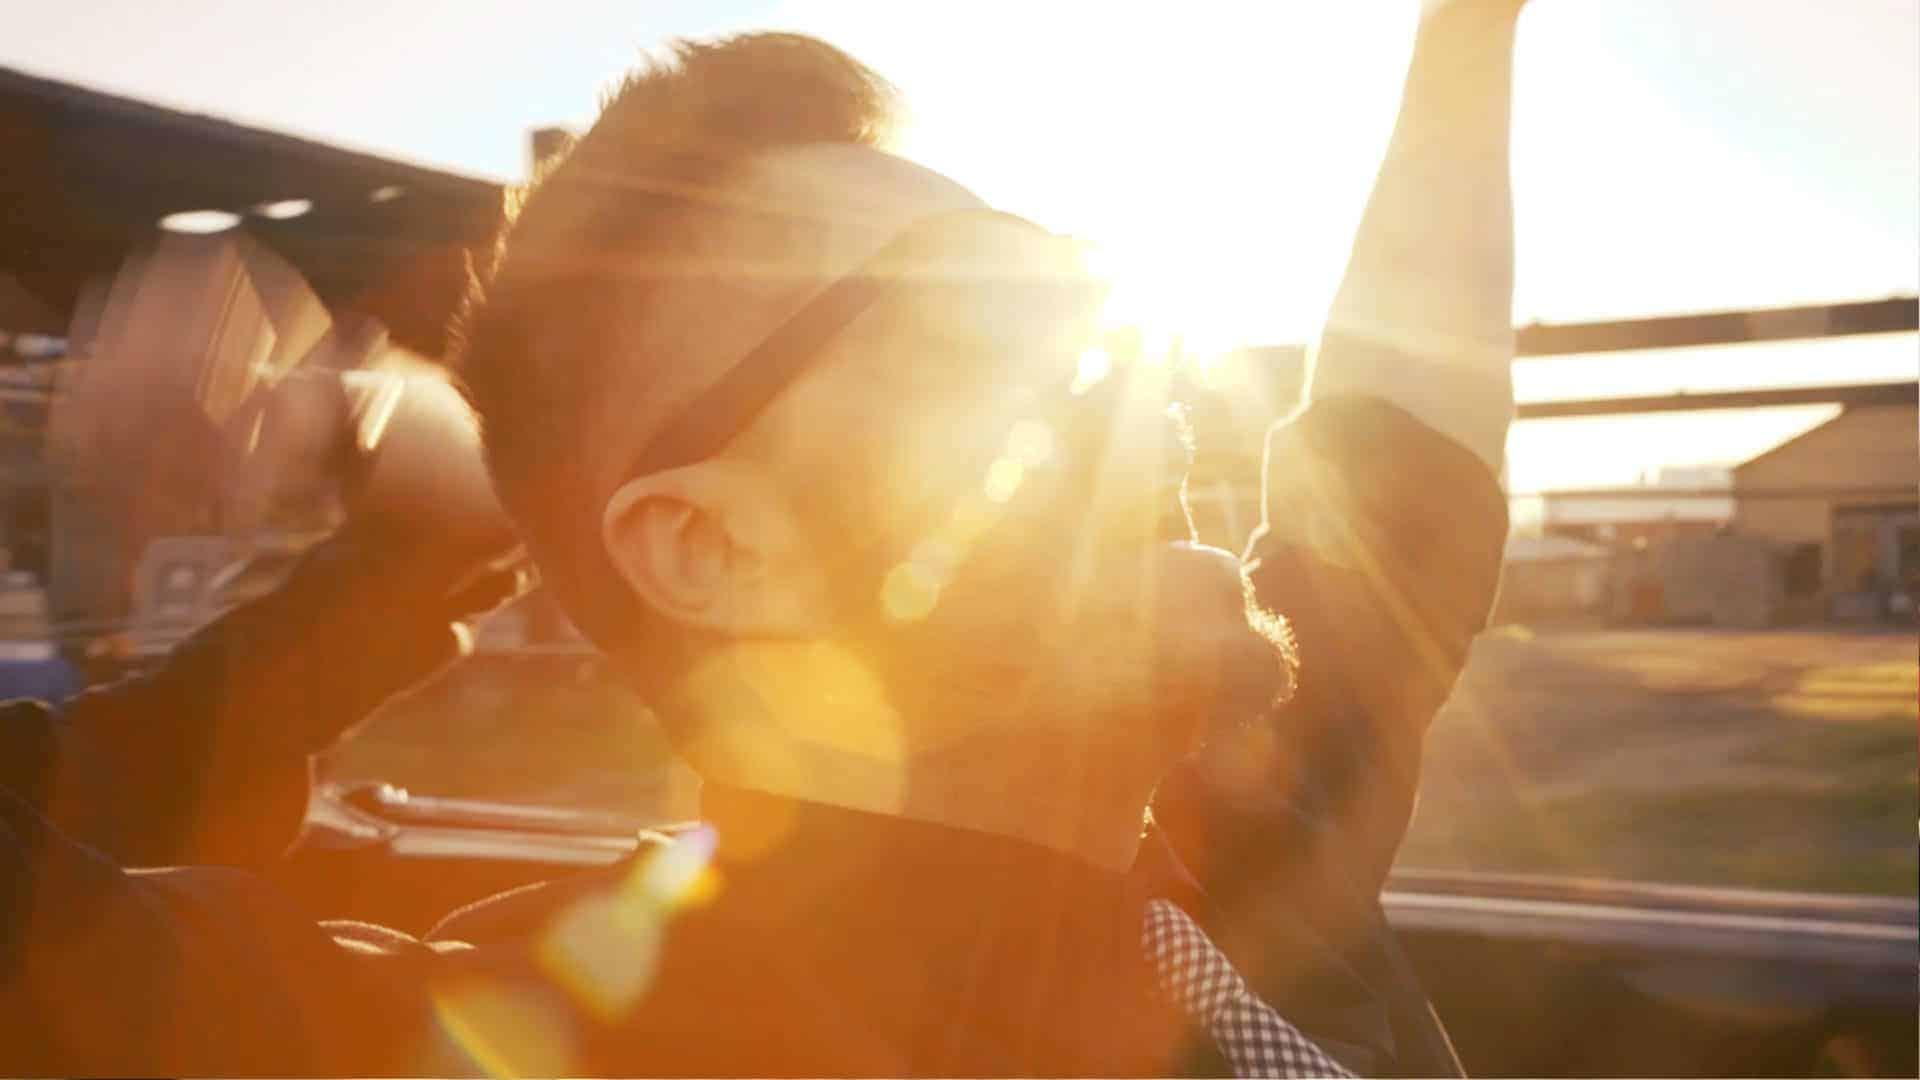 roka hueka music video still shot